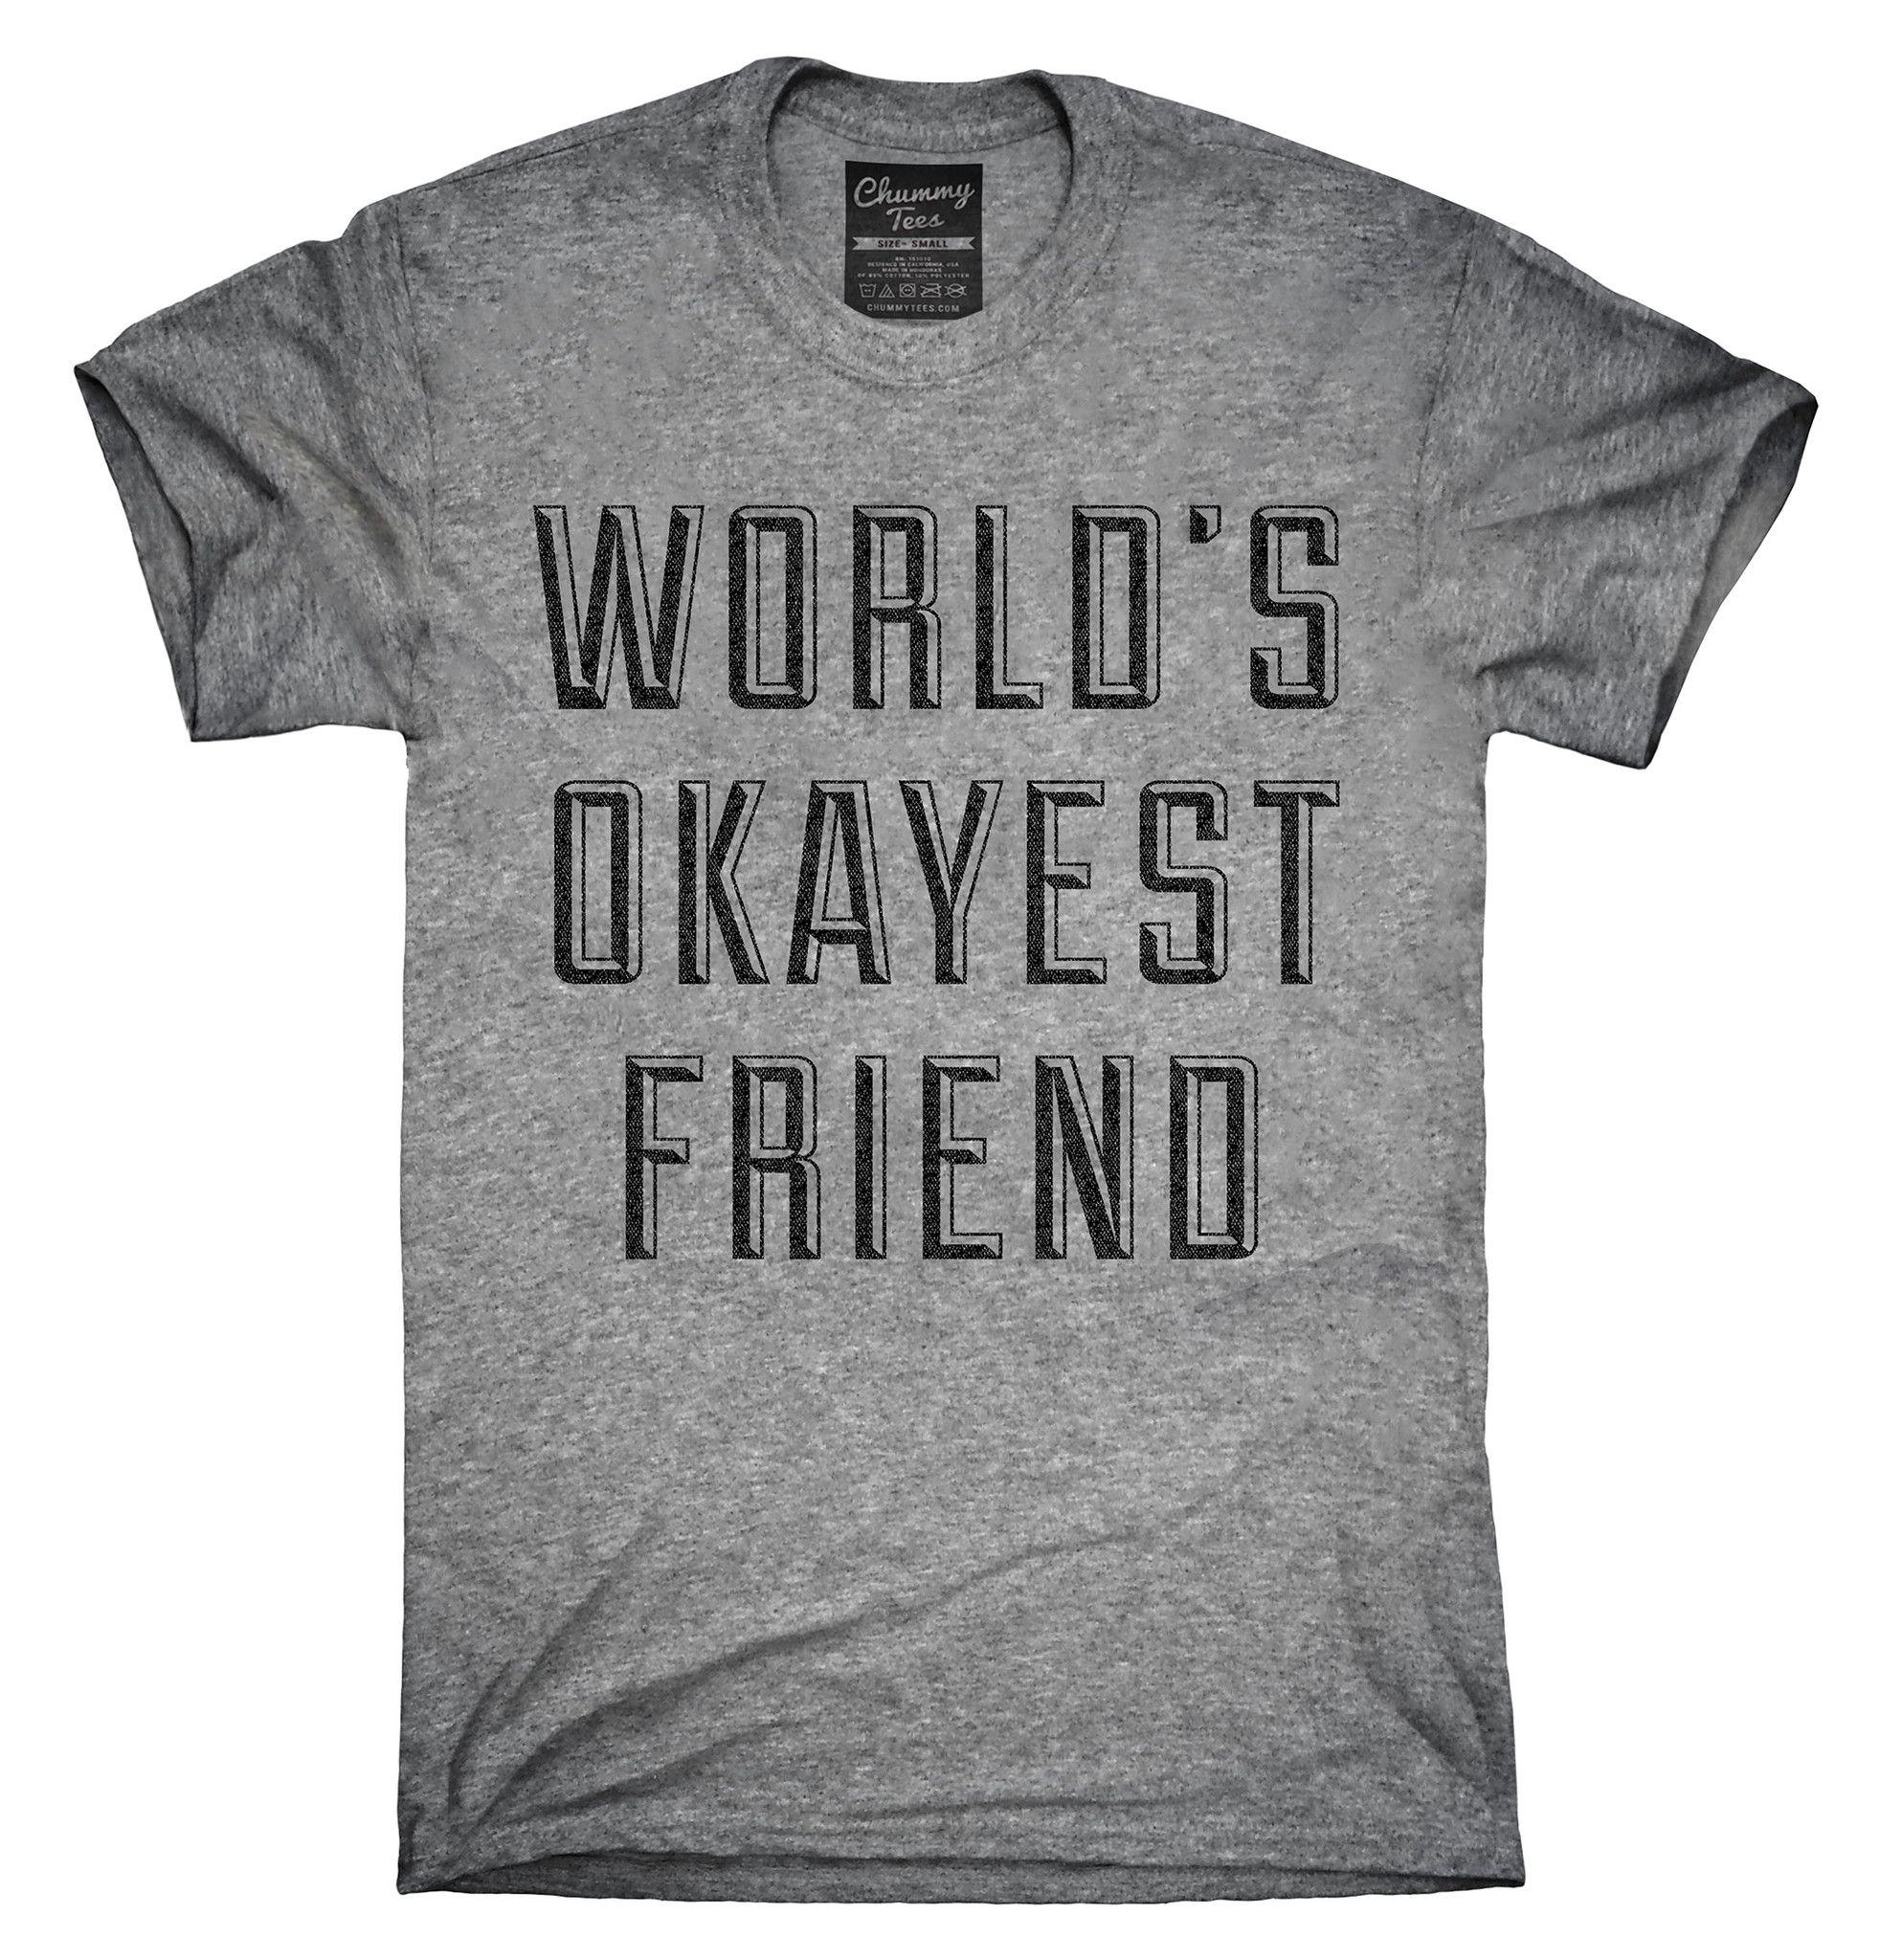 worlds okayest friend shirt, hoodies, tanktops | best friend